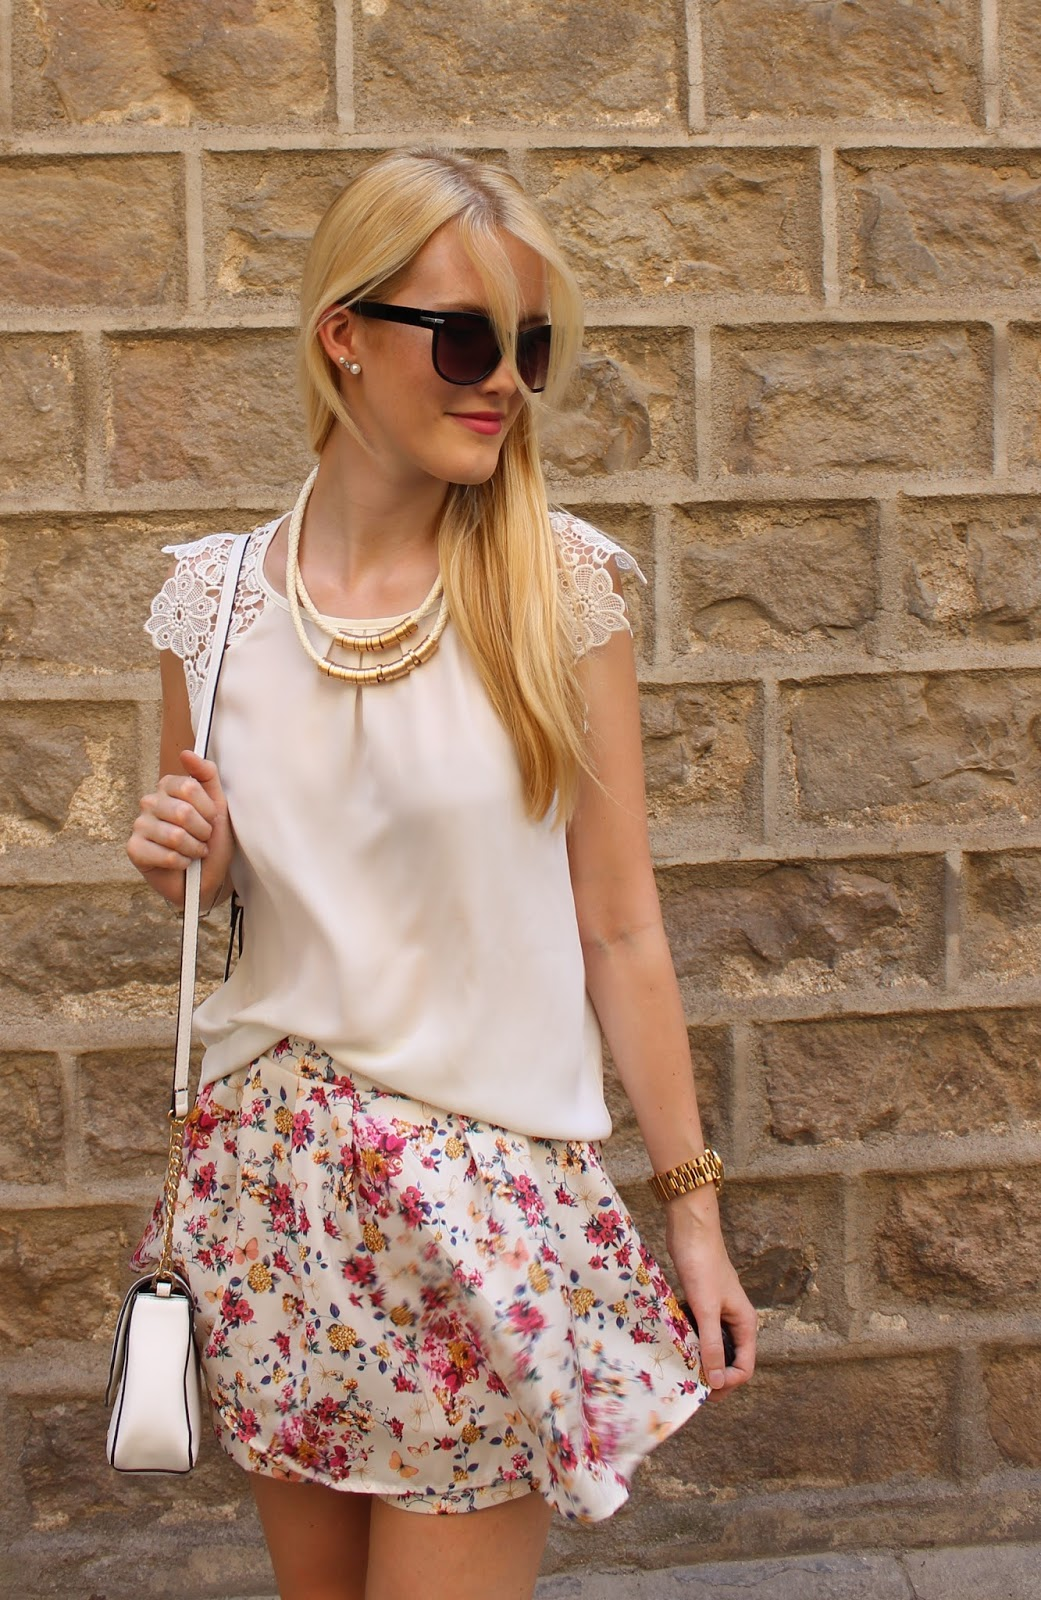 flower print skorts lace stradivarius zara mango flats outfit TheBlondeLion